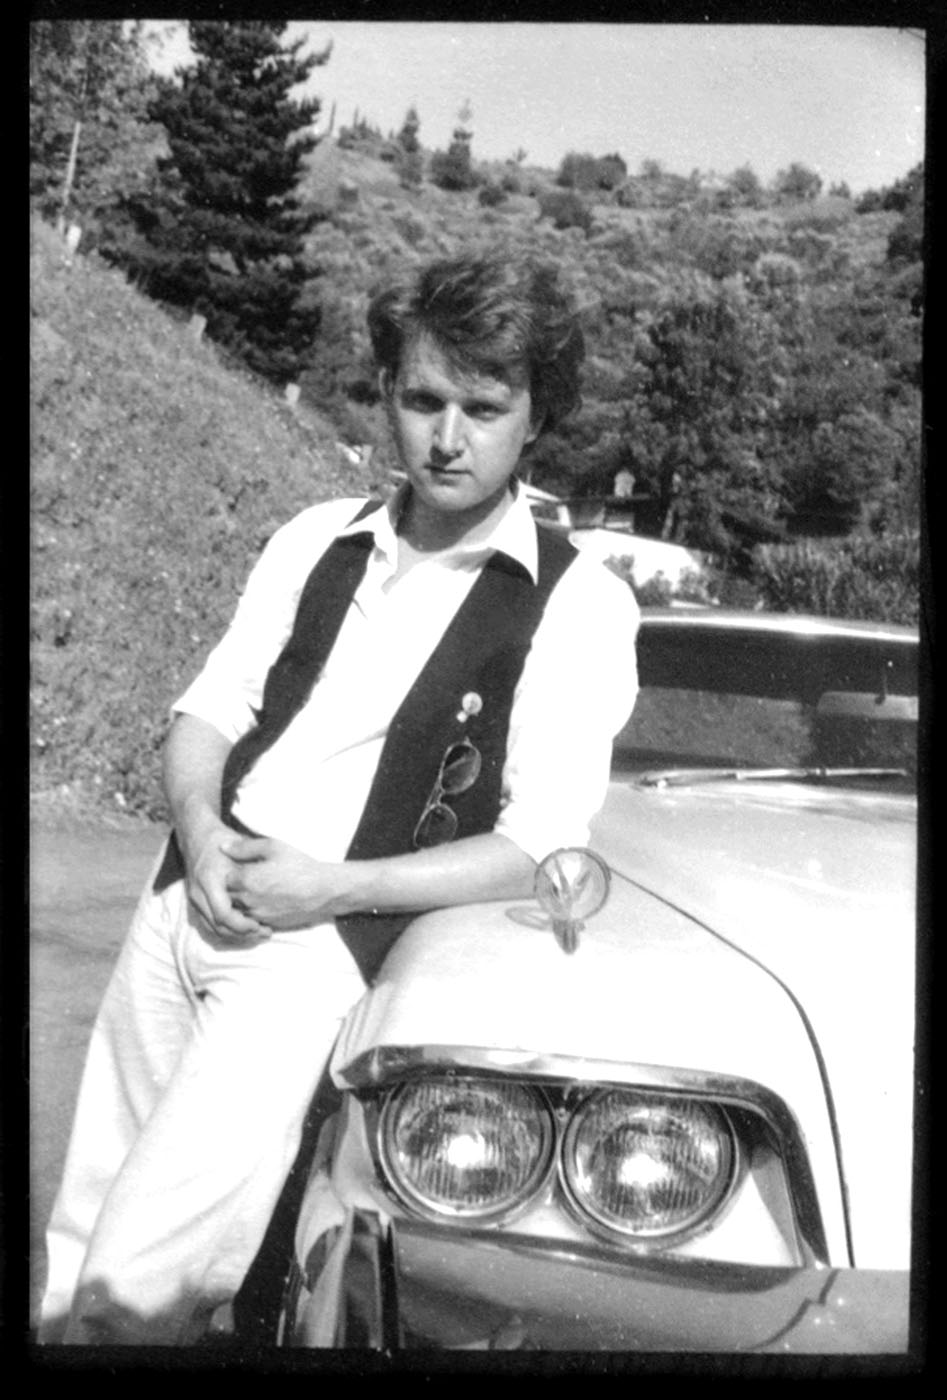 Dave in 1978